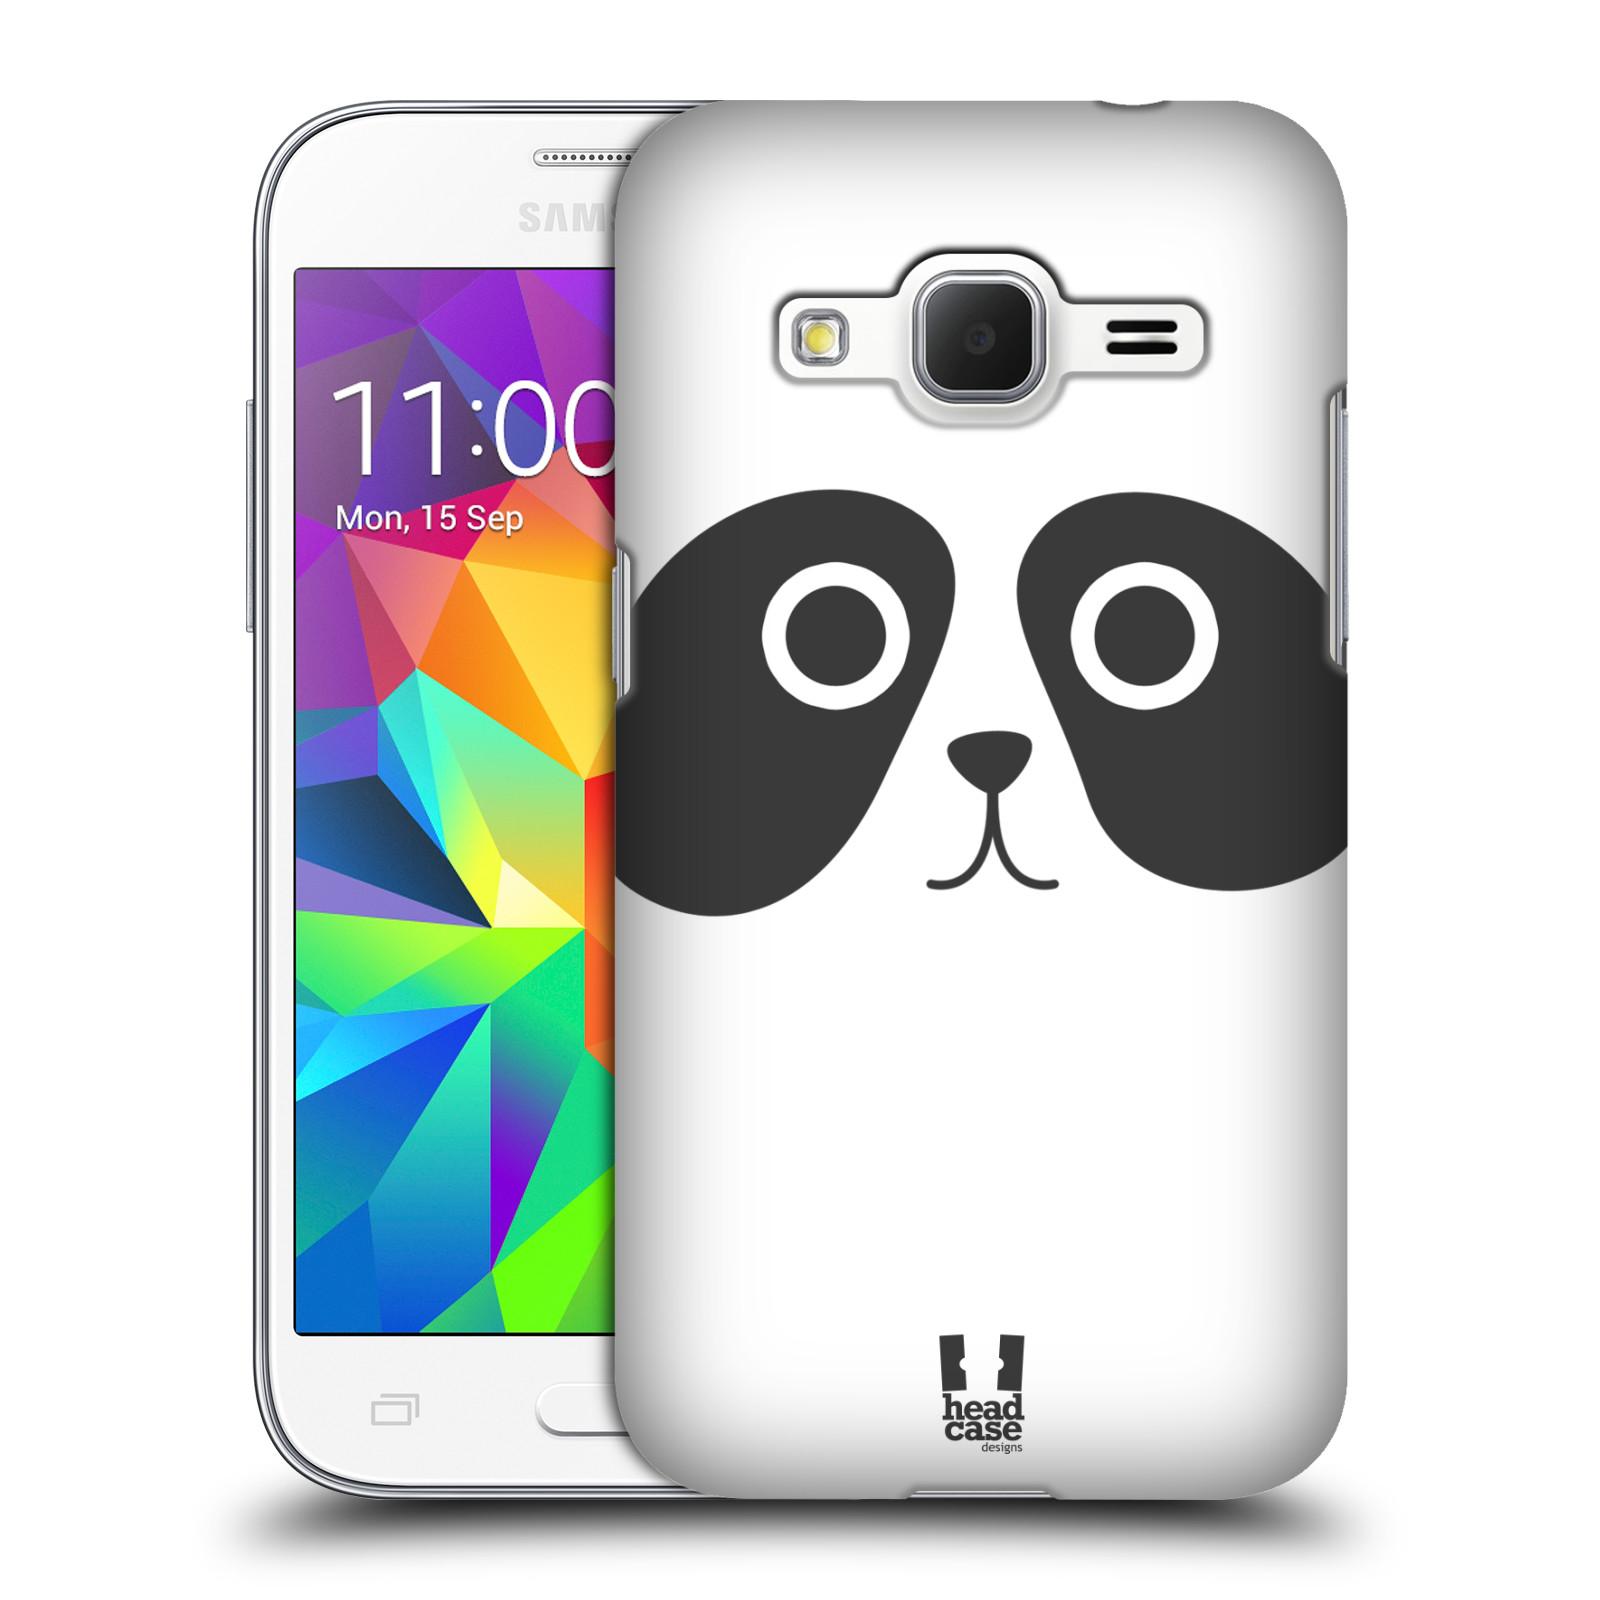 HEAD CASE plastový obal na mobil SAMSUNG GALAXY Core Prime (Core Prime VE) vzor Cartoon Karikatura kreslená zvířátka panda